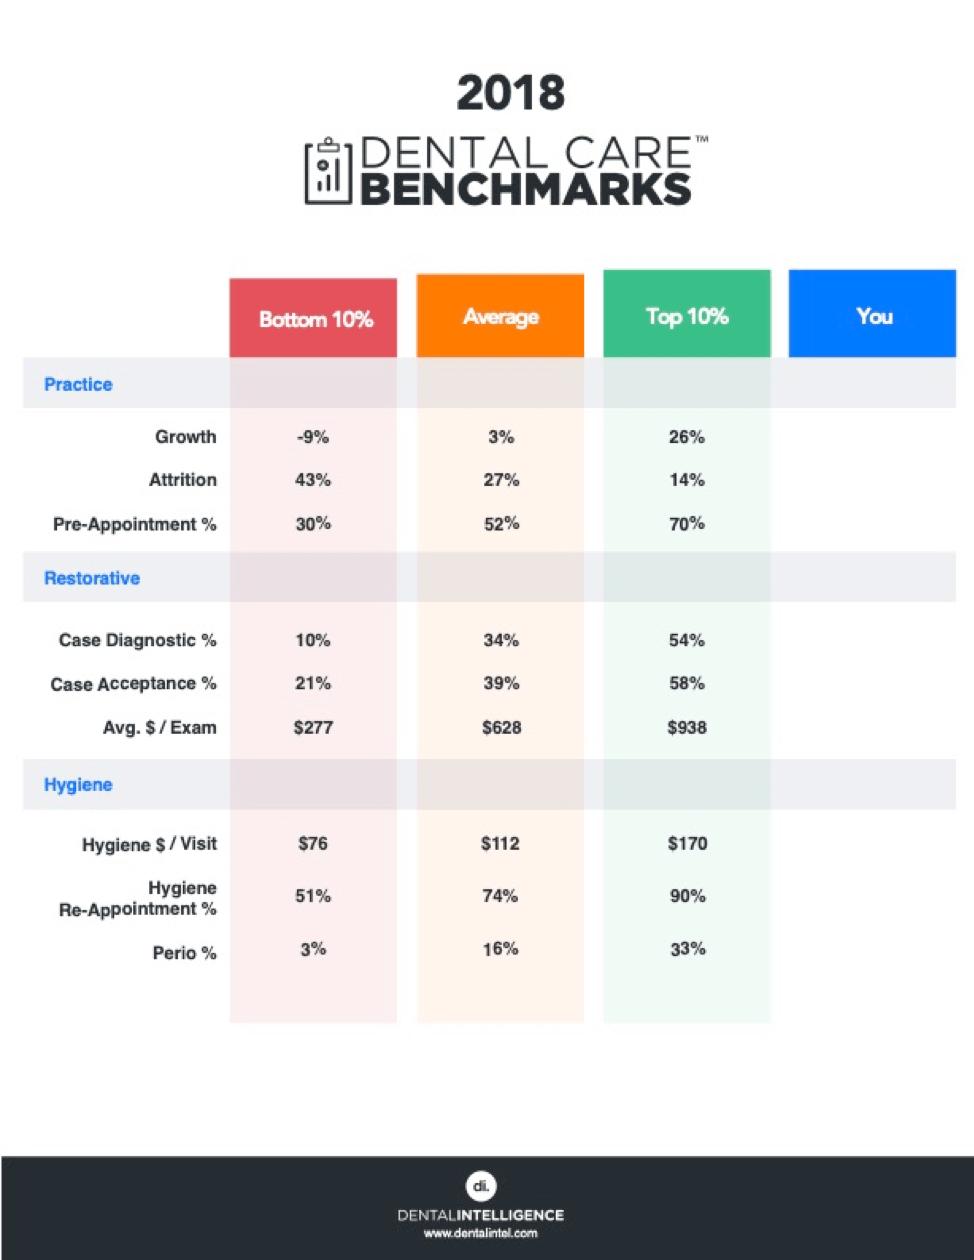 2018 Benchmarks